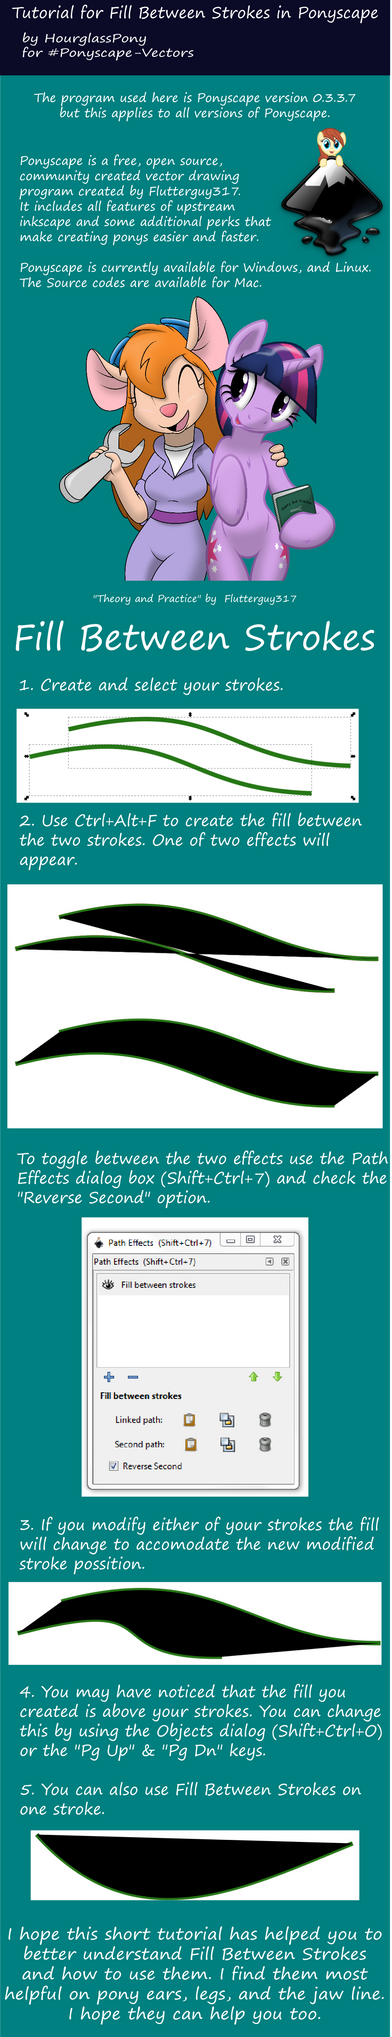 Fill Between Strokes Tutorial by Hourglass-Vectors